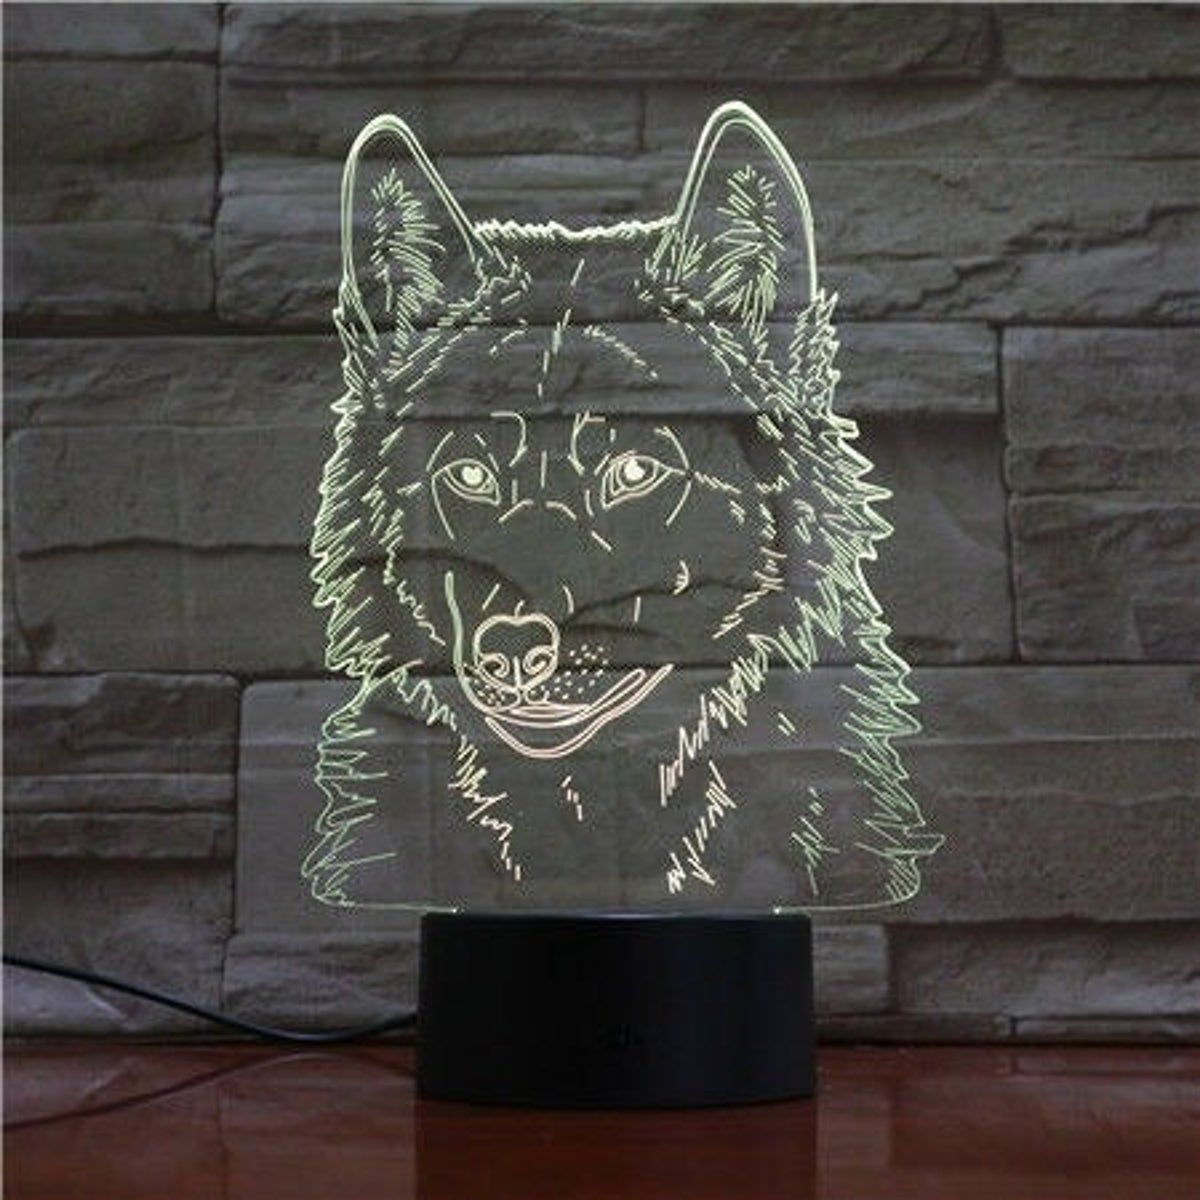 Wolf Lobo Dog Led Nightlight Lamp Lamp Night Light Lamp 3d Optical Illusions